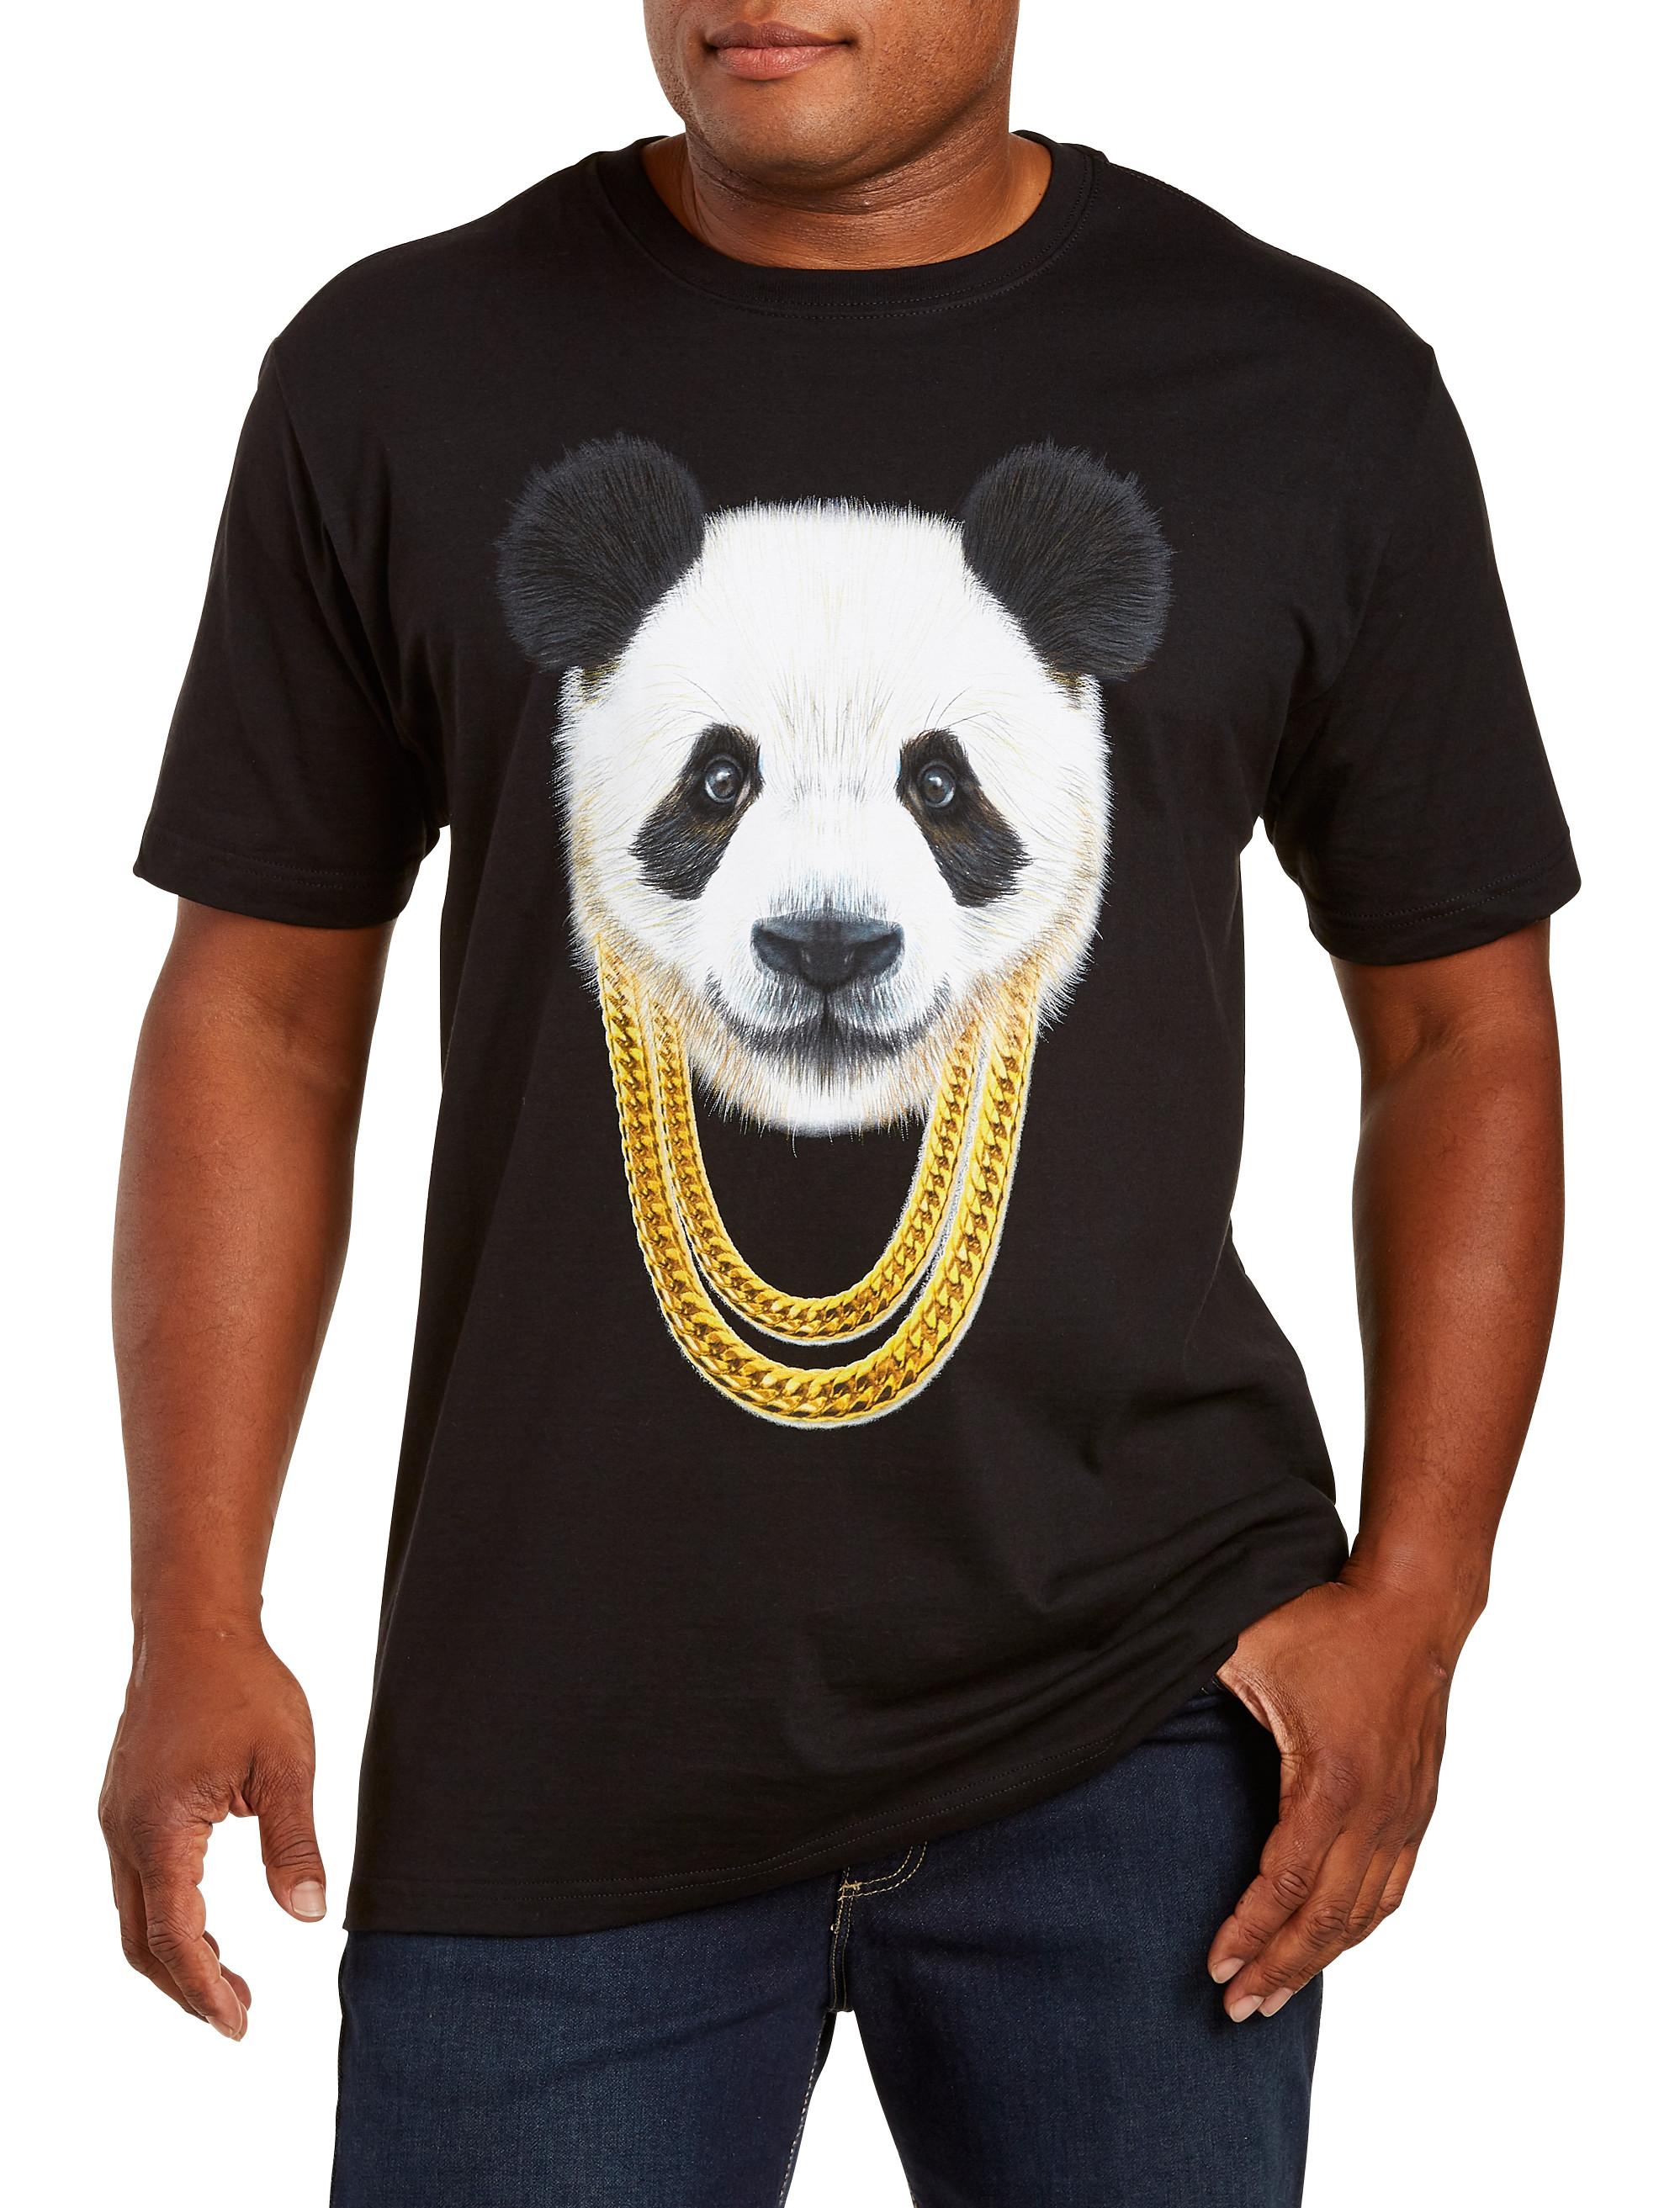 Panda Graphic Tee | Tuggl